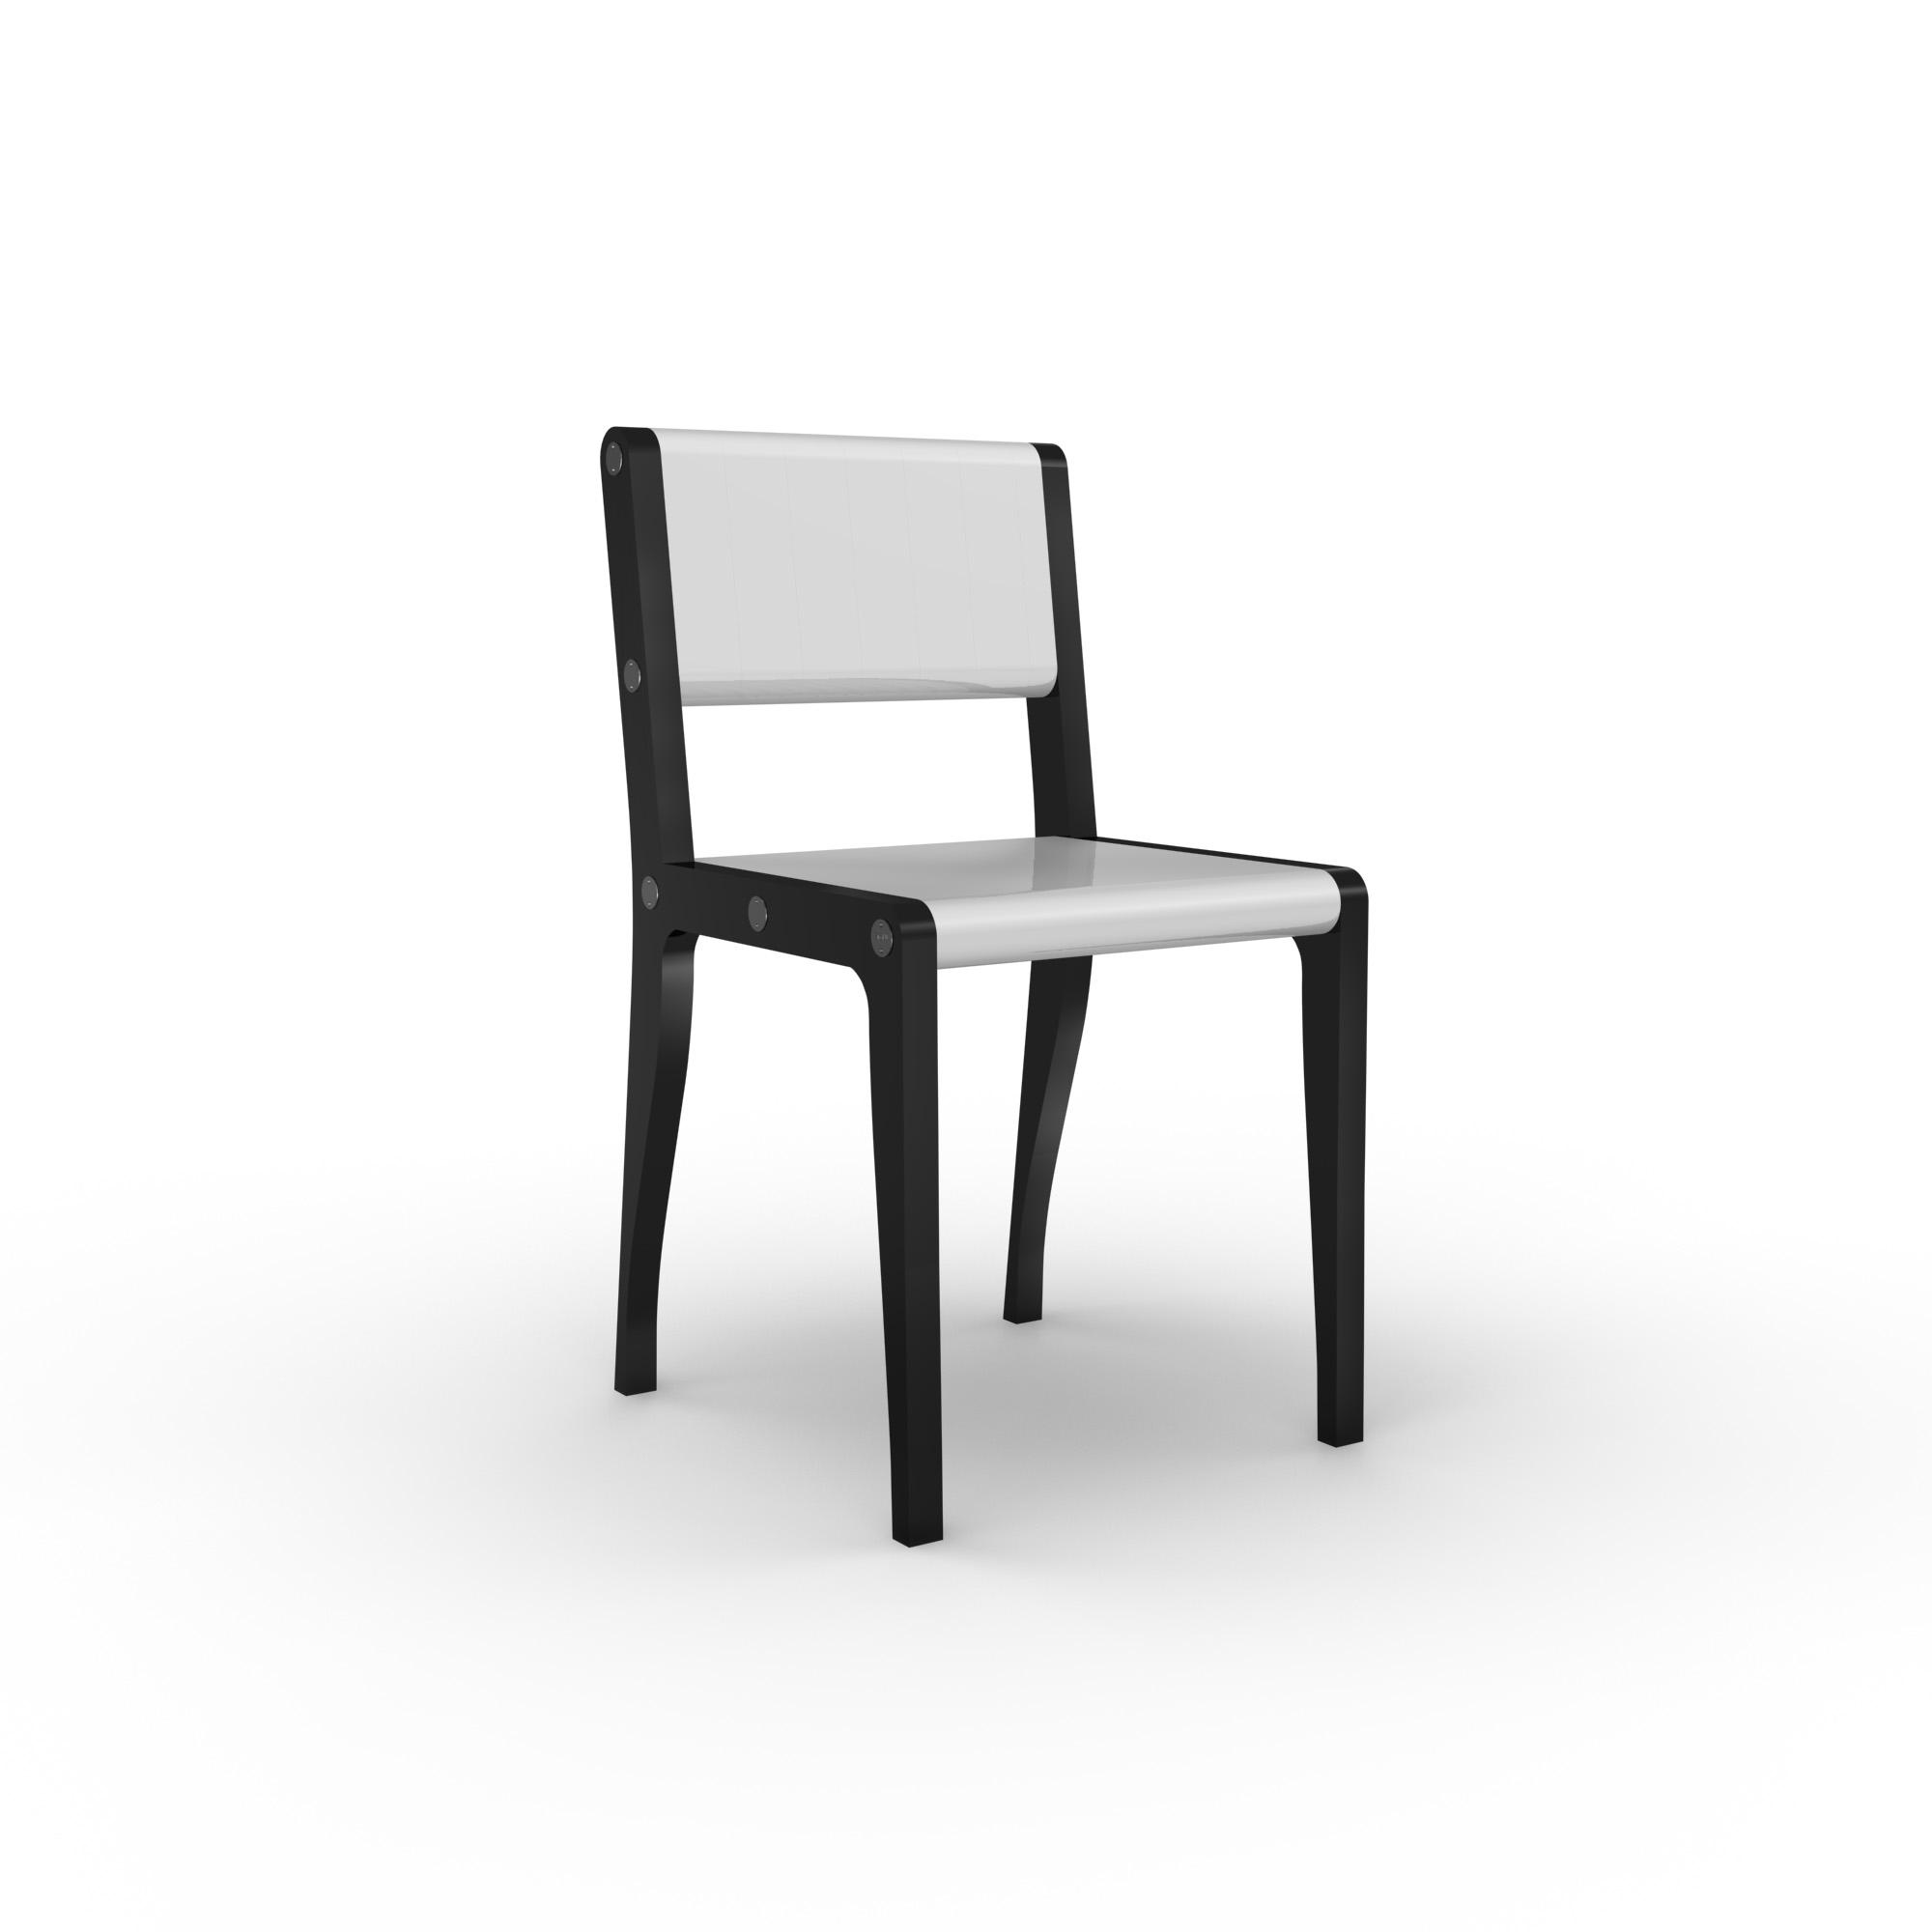 diseño industrial santander - Beusual - Sirak - silla black and white 2